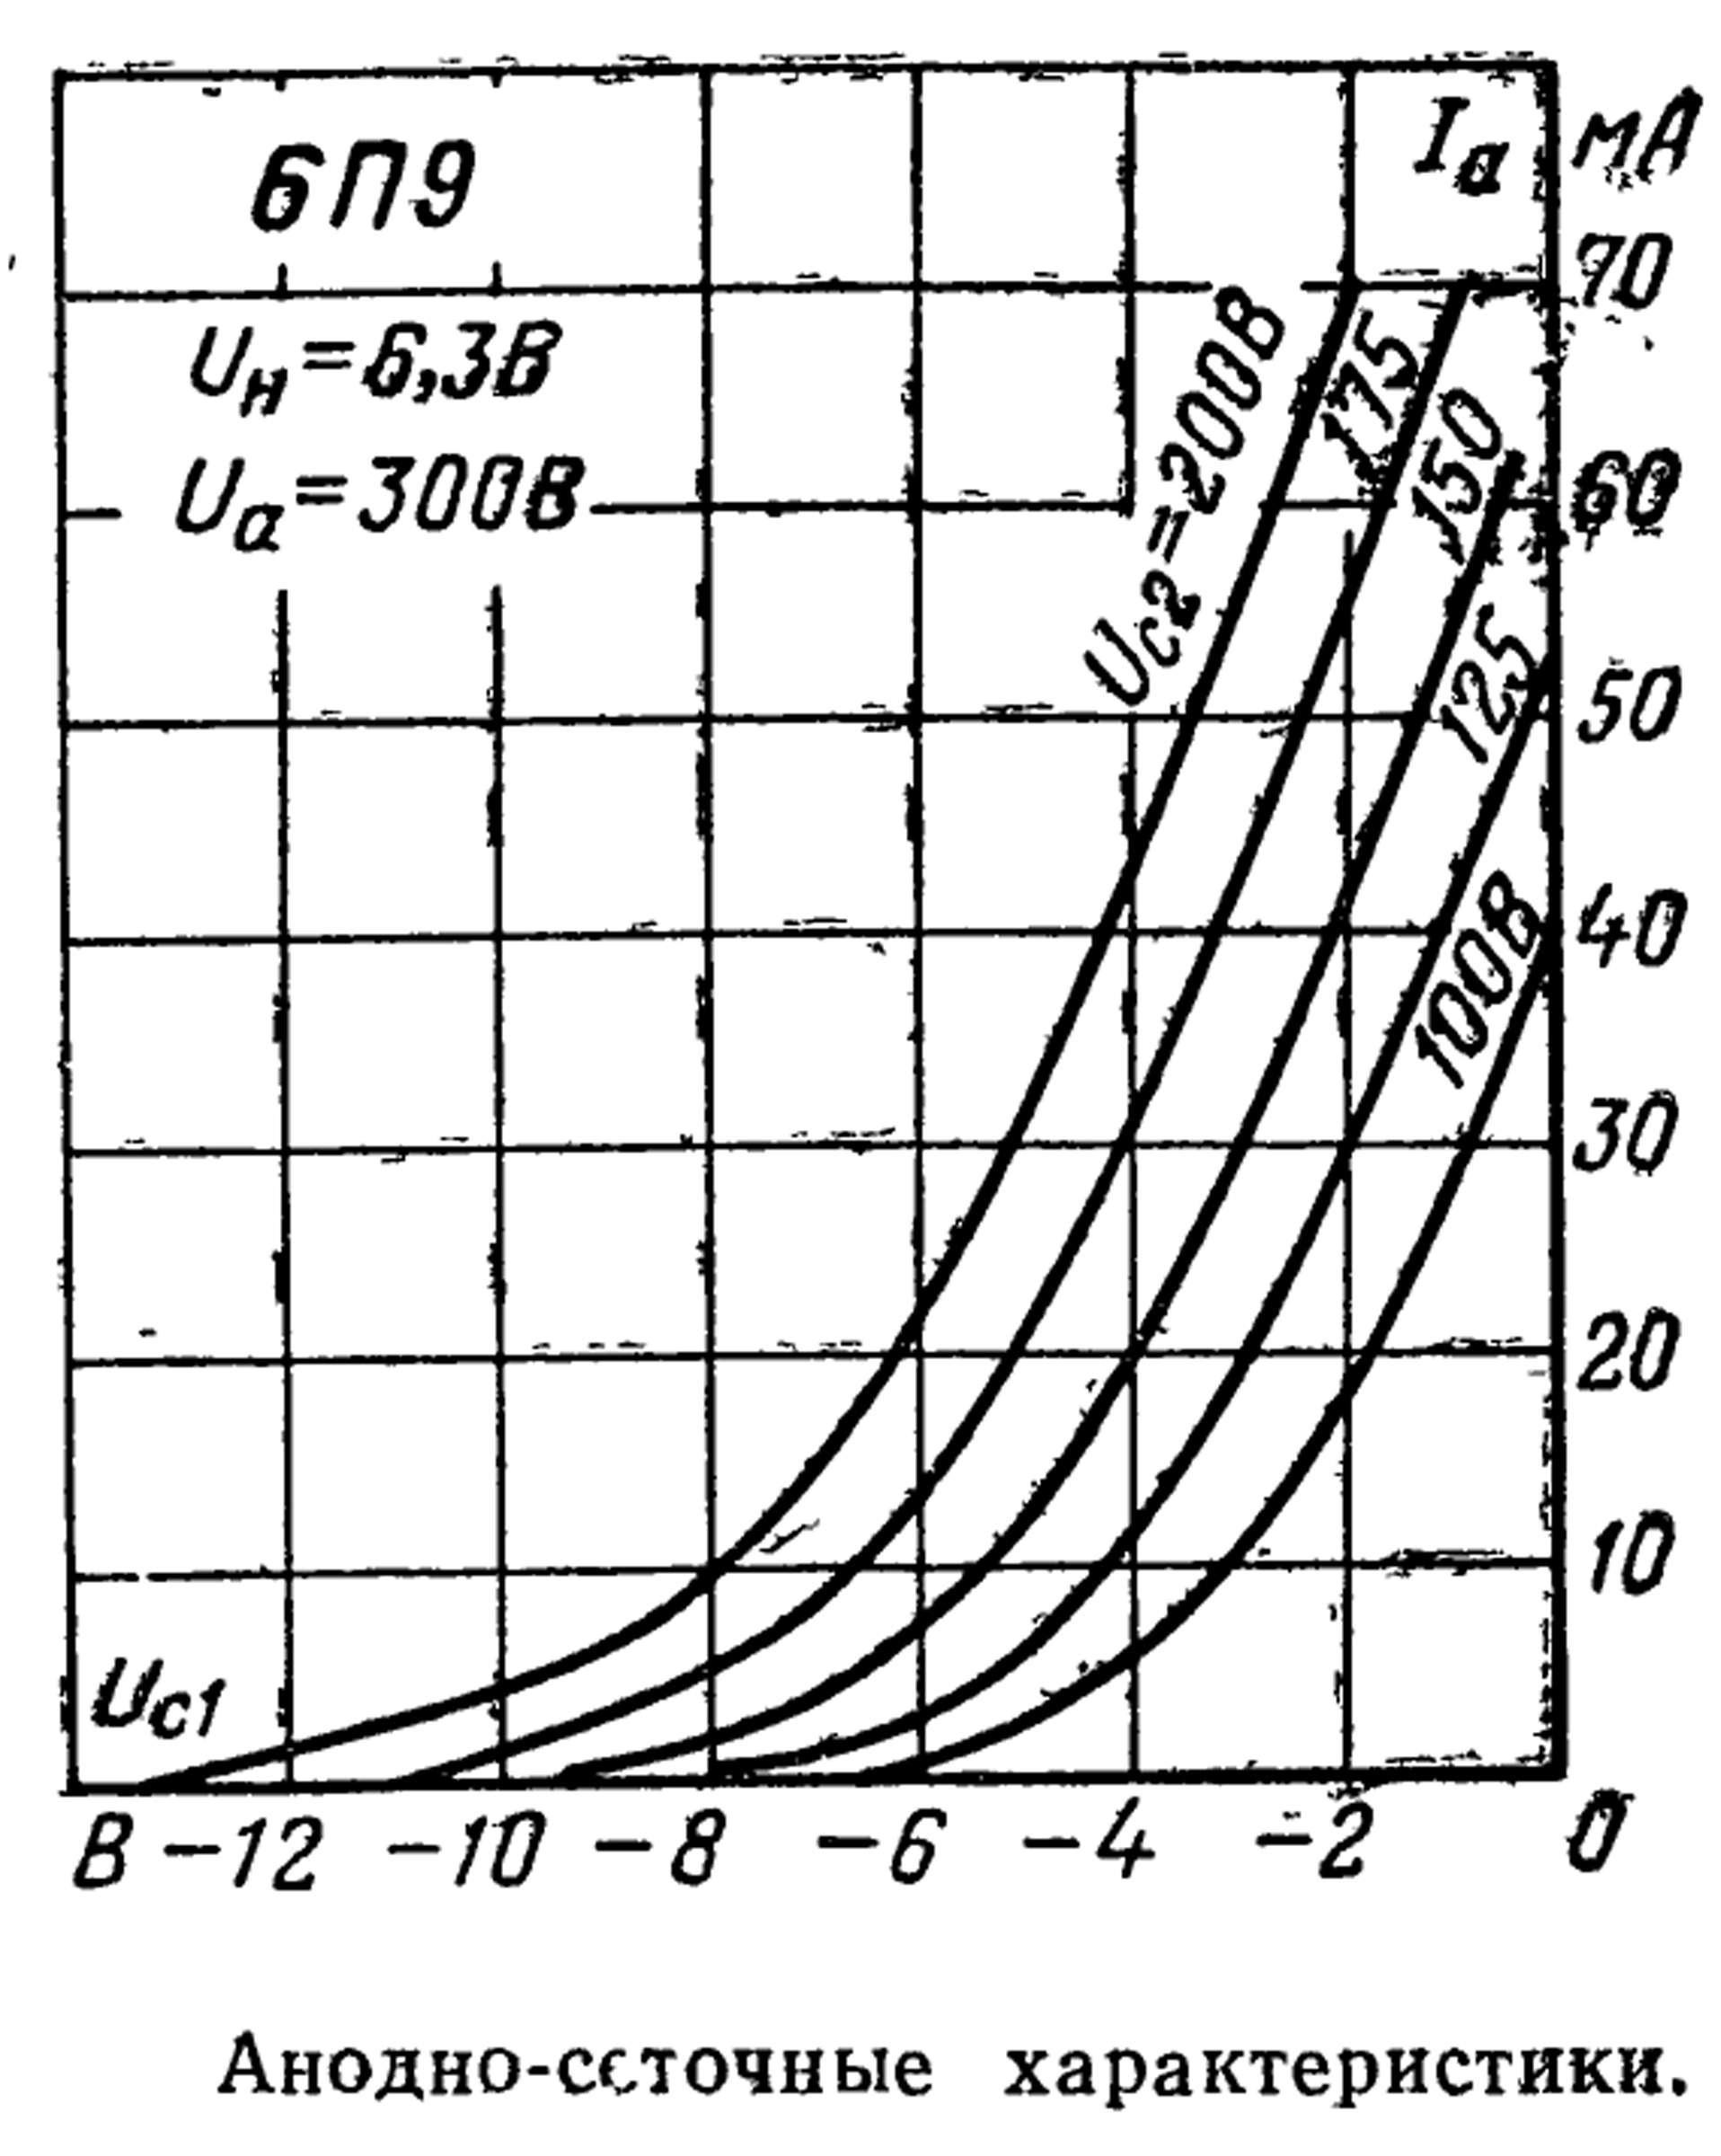 Параметры радиолампы 6П9